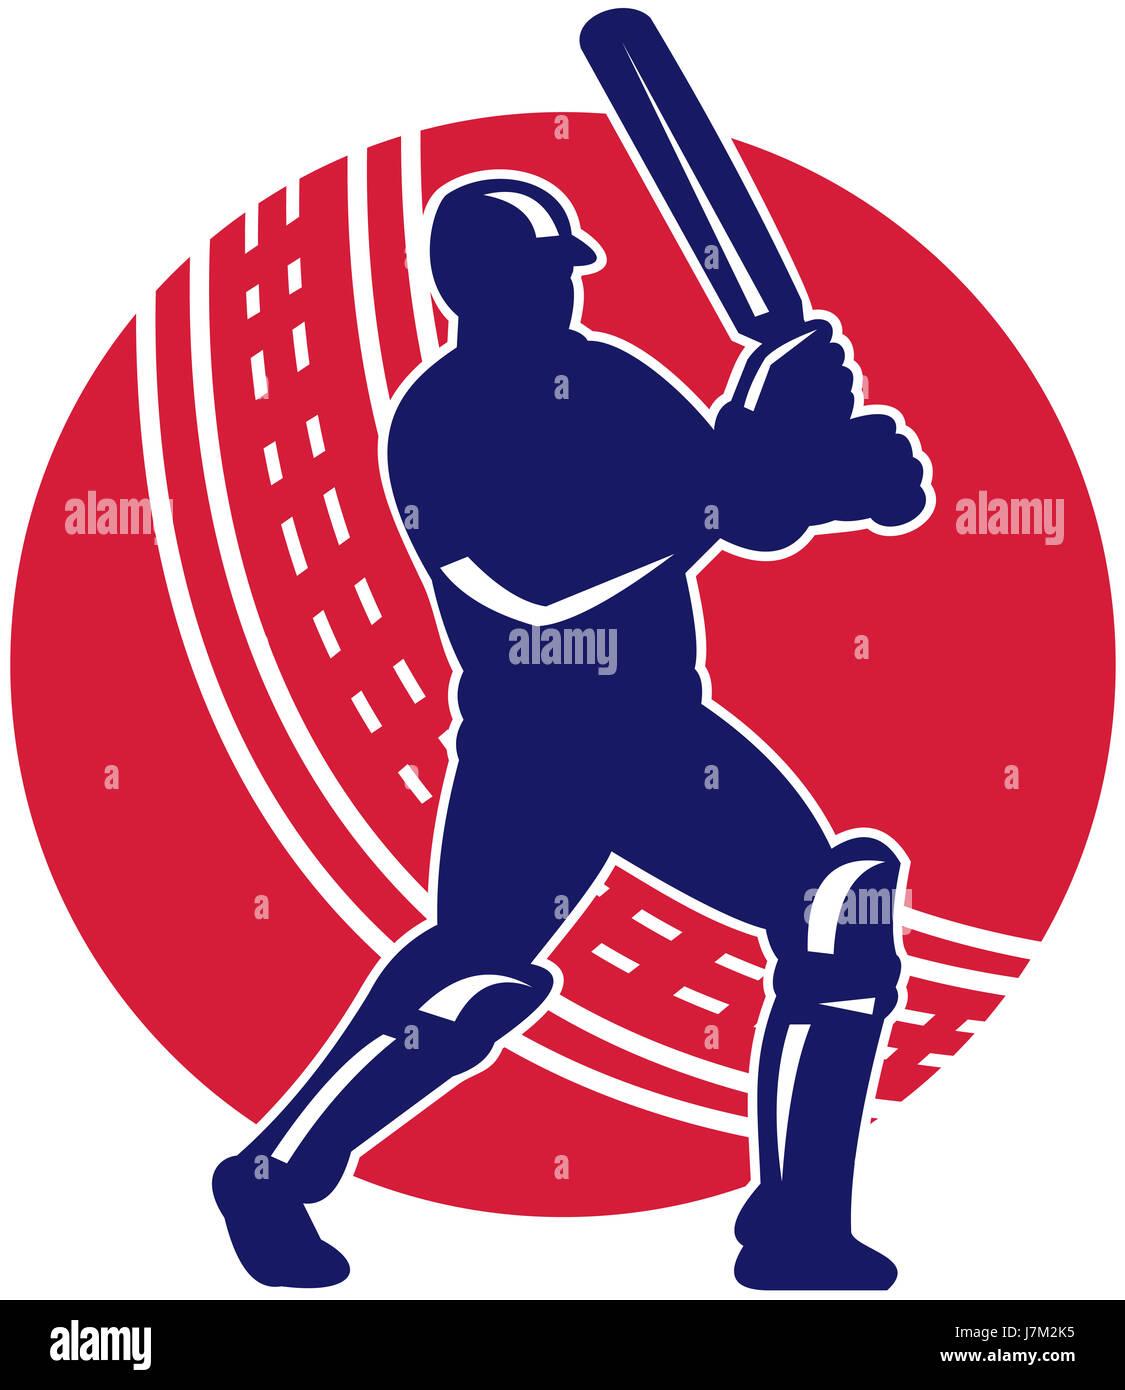 ball illustration player retro athlete batsman batting cricket sport sports - Stock Image